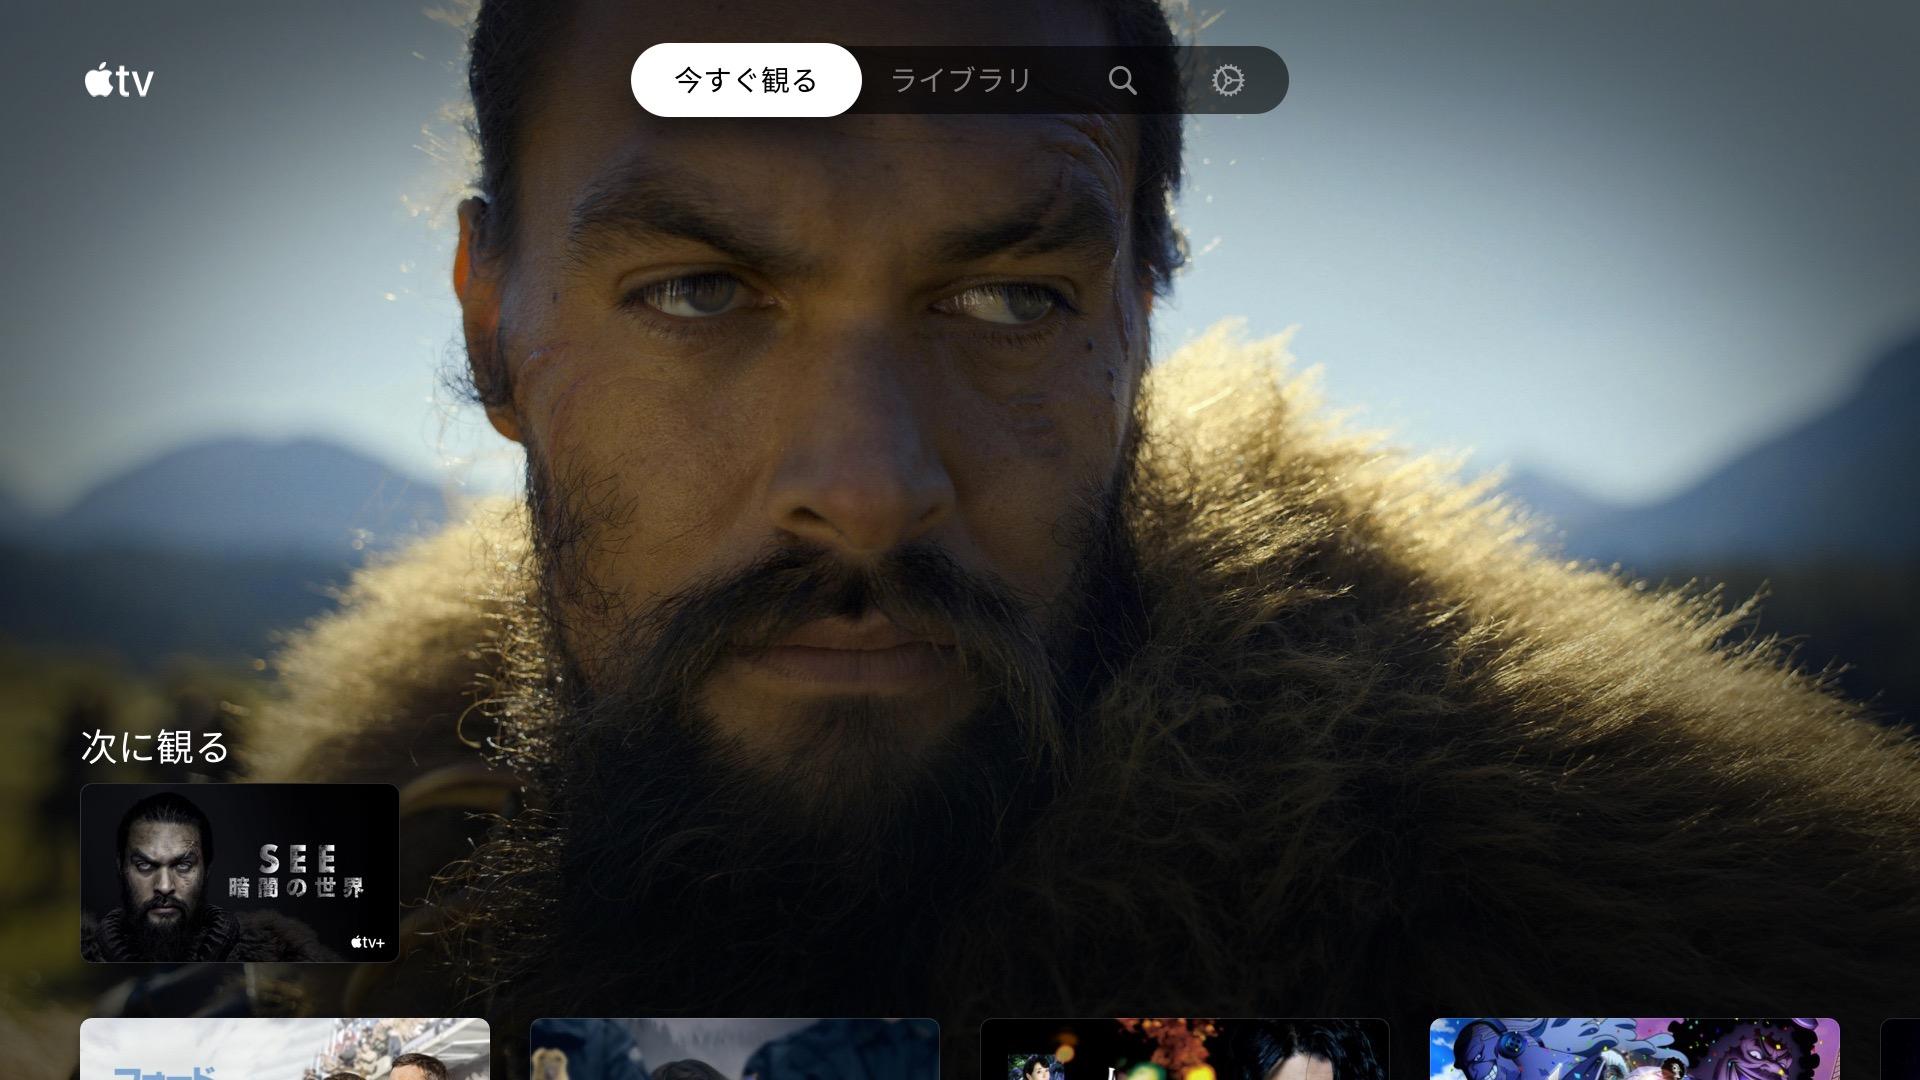 Apple TVアプリ、ようやくFire TVでも利用可能に